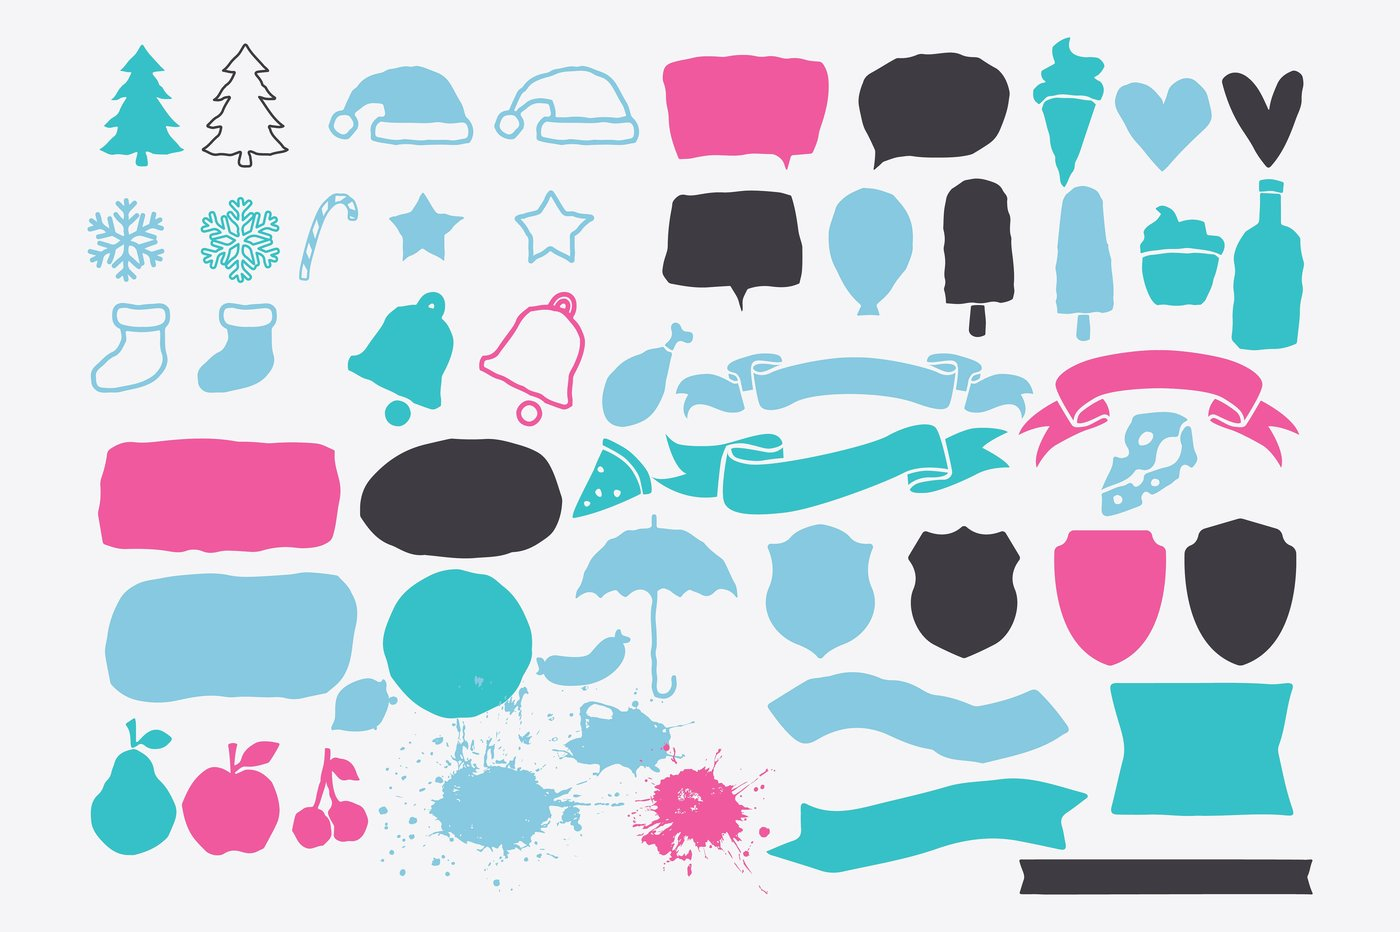 The December Design Bundle by TheHungryJPEG.